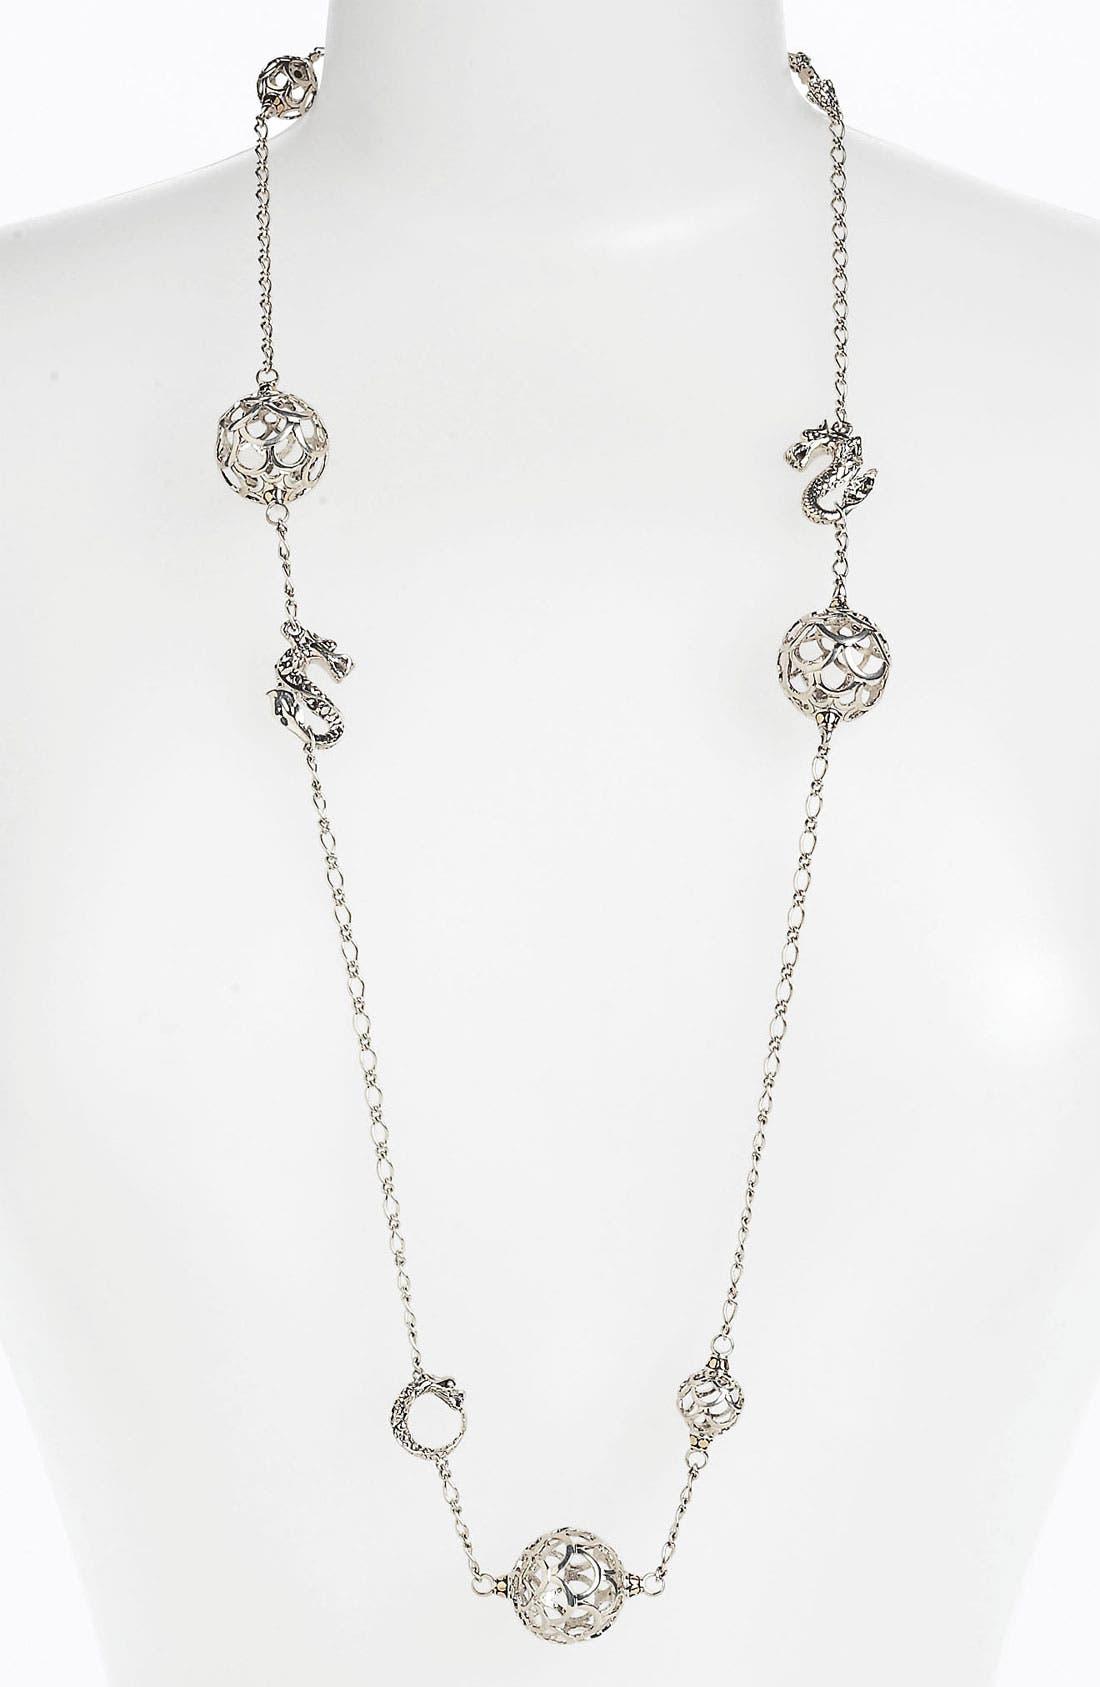 Alternate Image 1 Selected - John Hardy 'Naga Gold & Silver' Long Sautoir Necklace